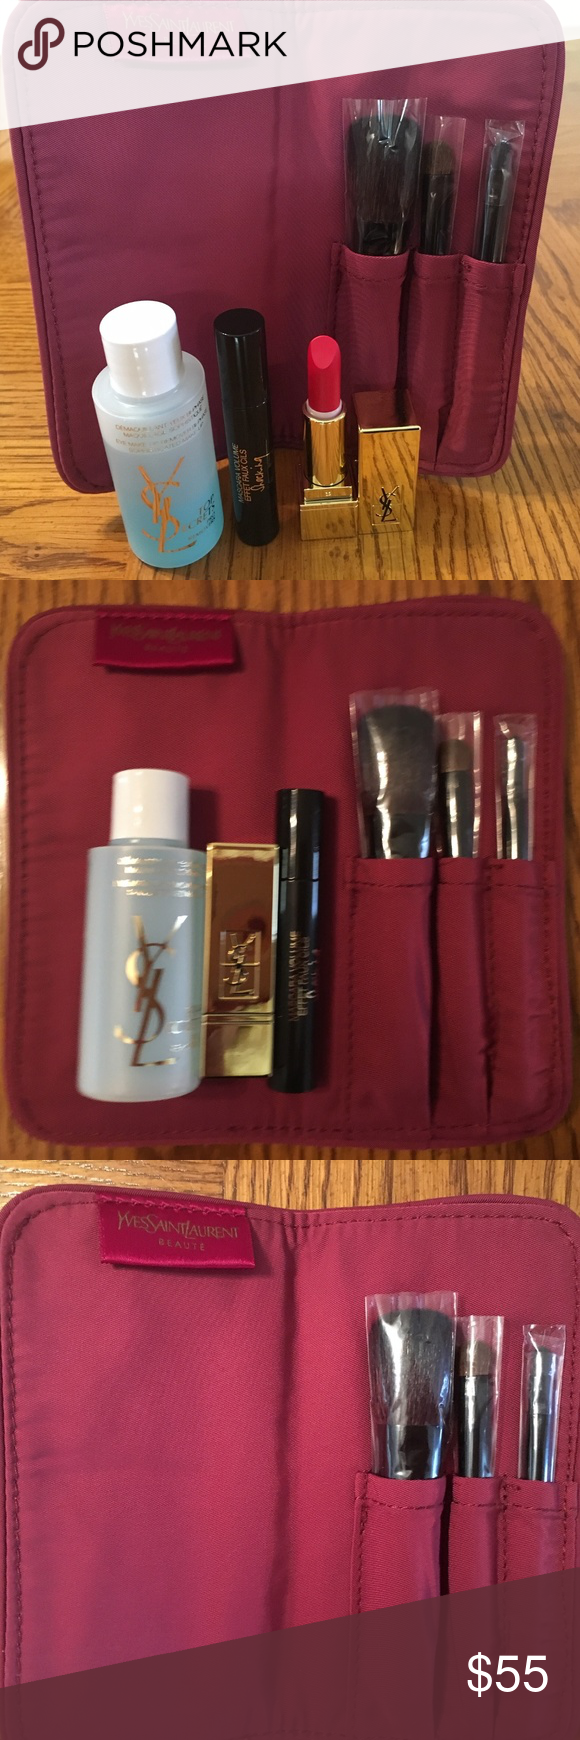 Yves Saint Laurent Brush/Mascara/Lipstick Bundle Hey